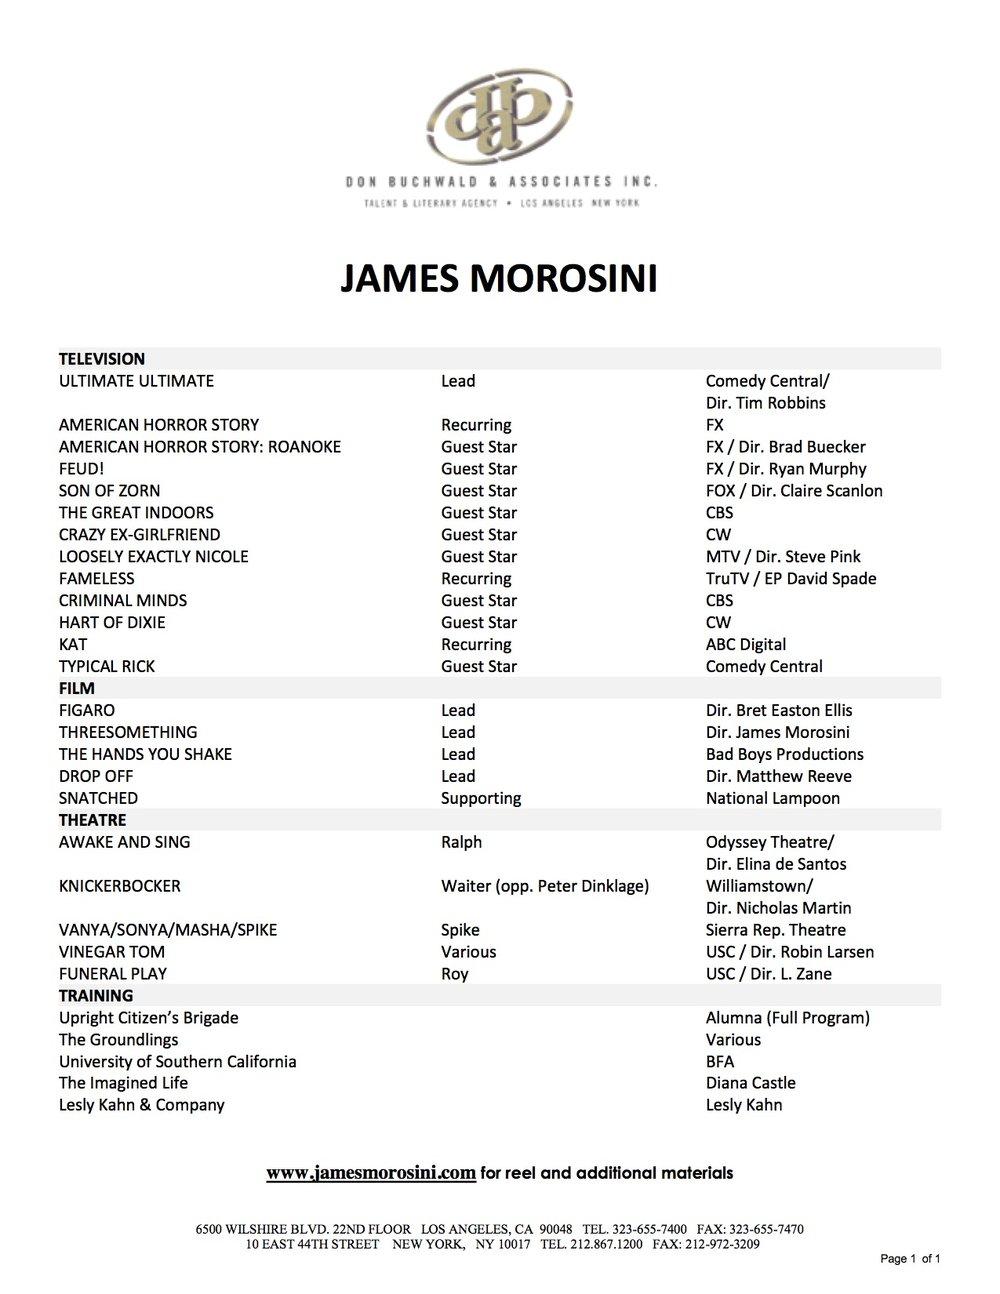 James Morosini Resume